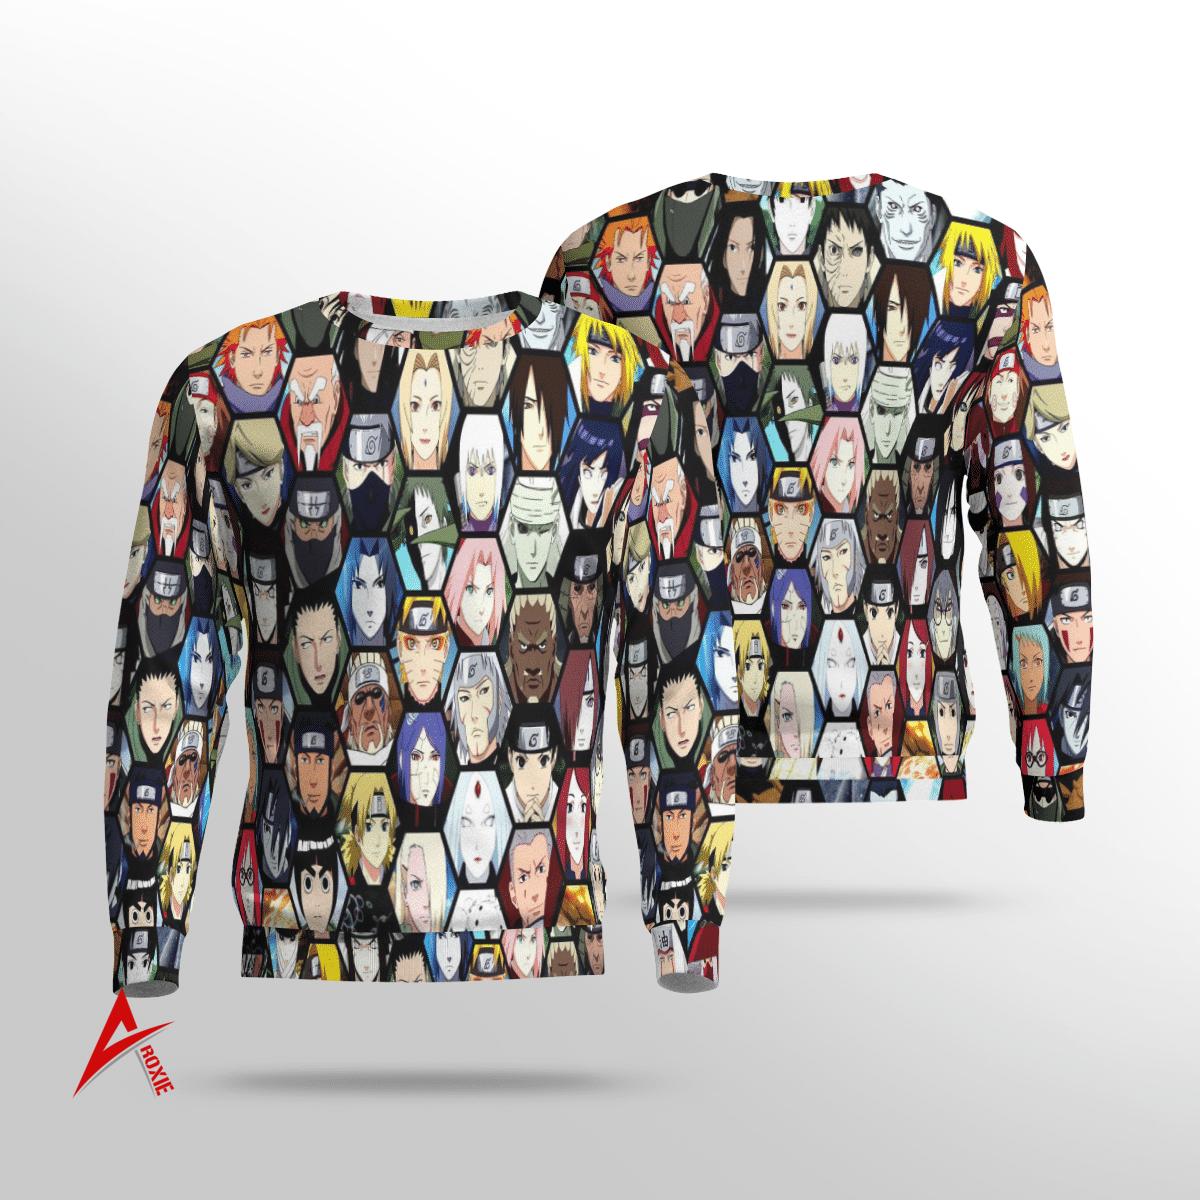 Naruto Characters All Sweatshirt 3D